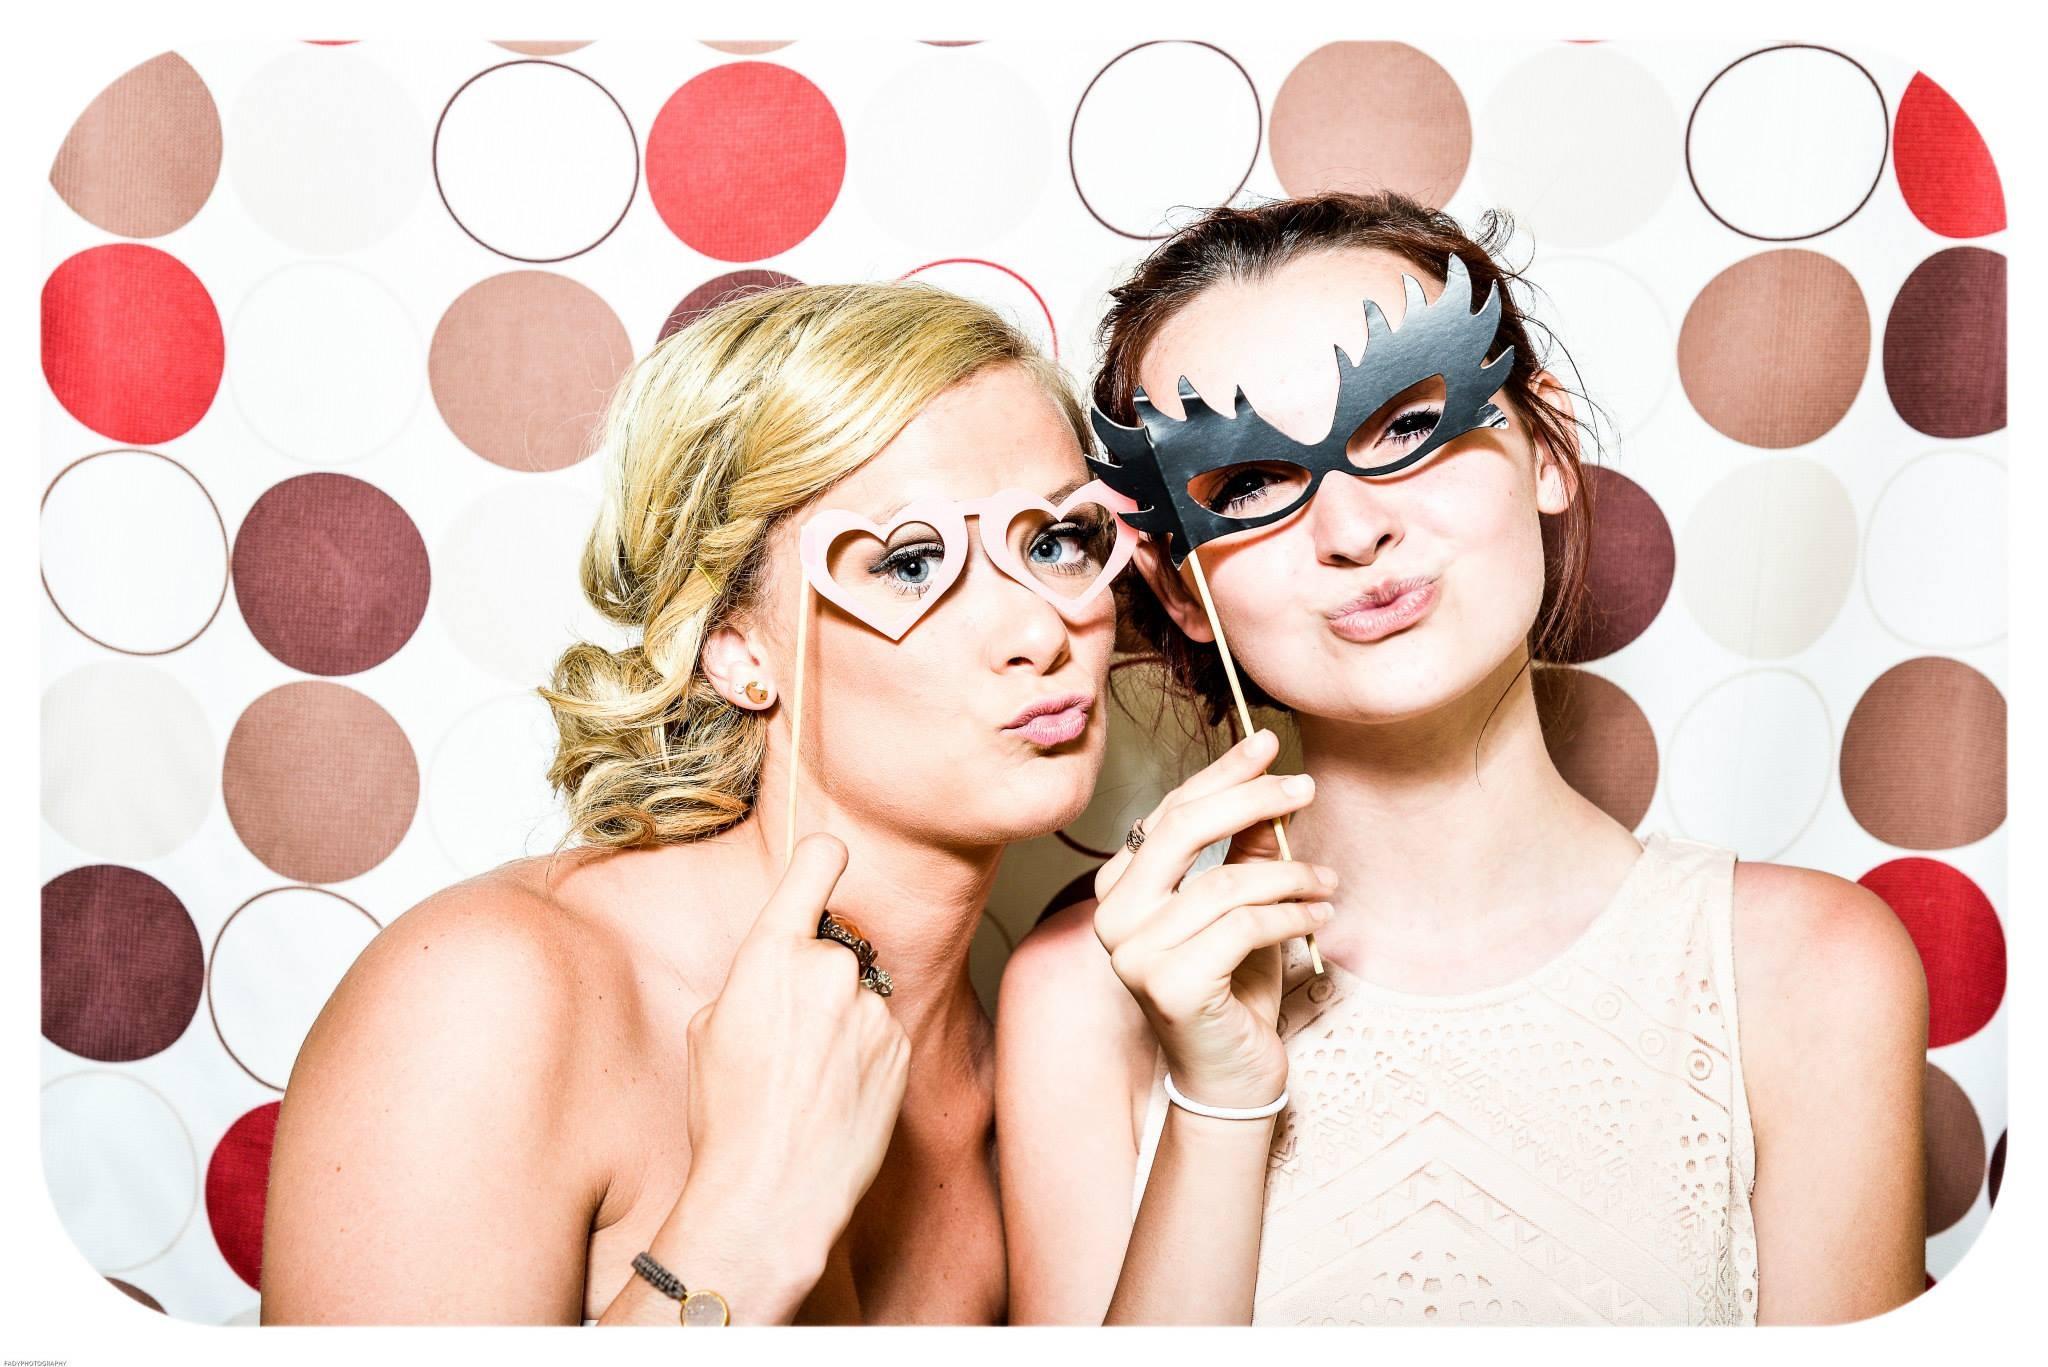 photo-booth-wedding-party-girls-160420.jpg